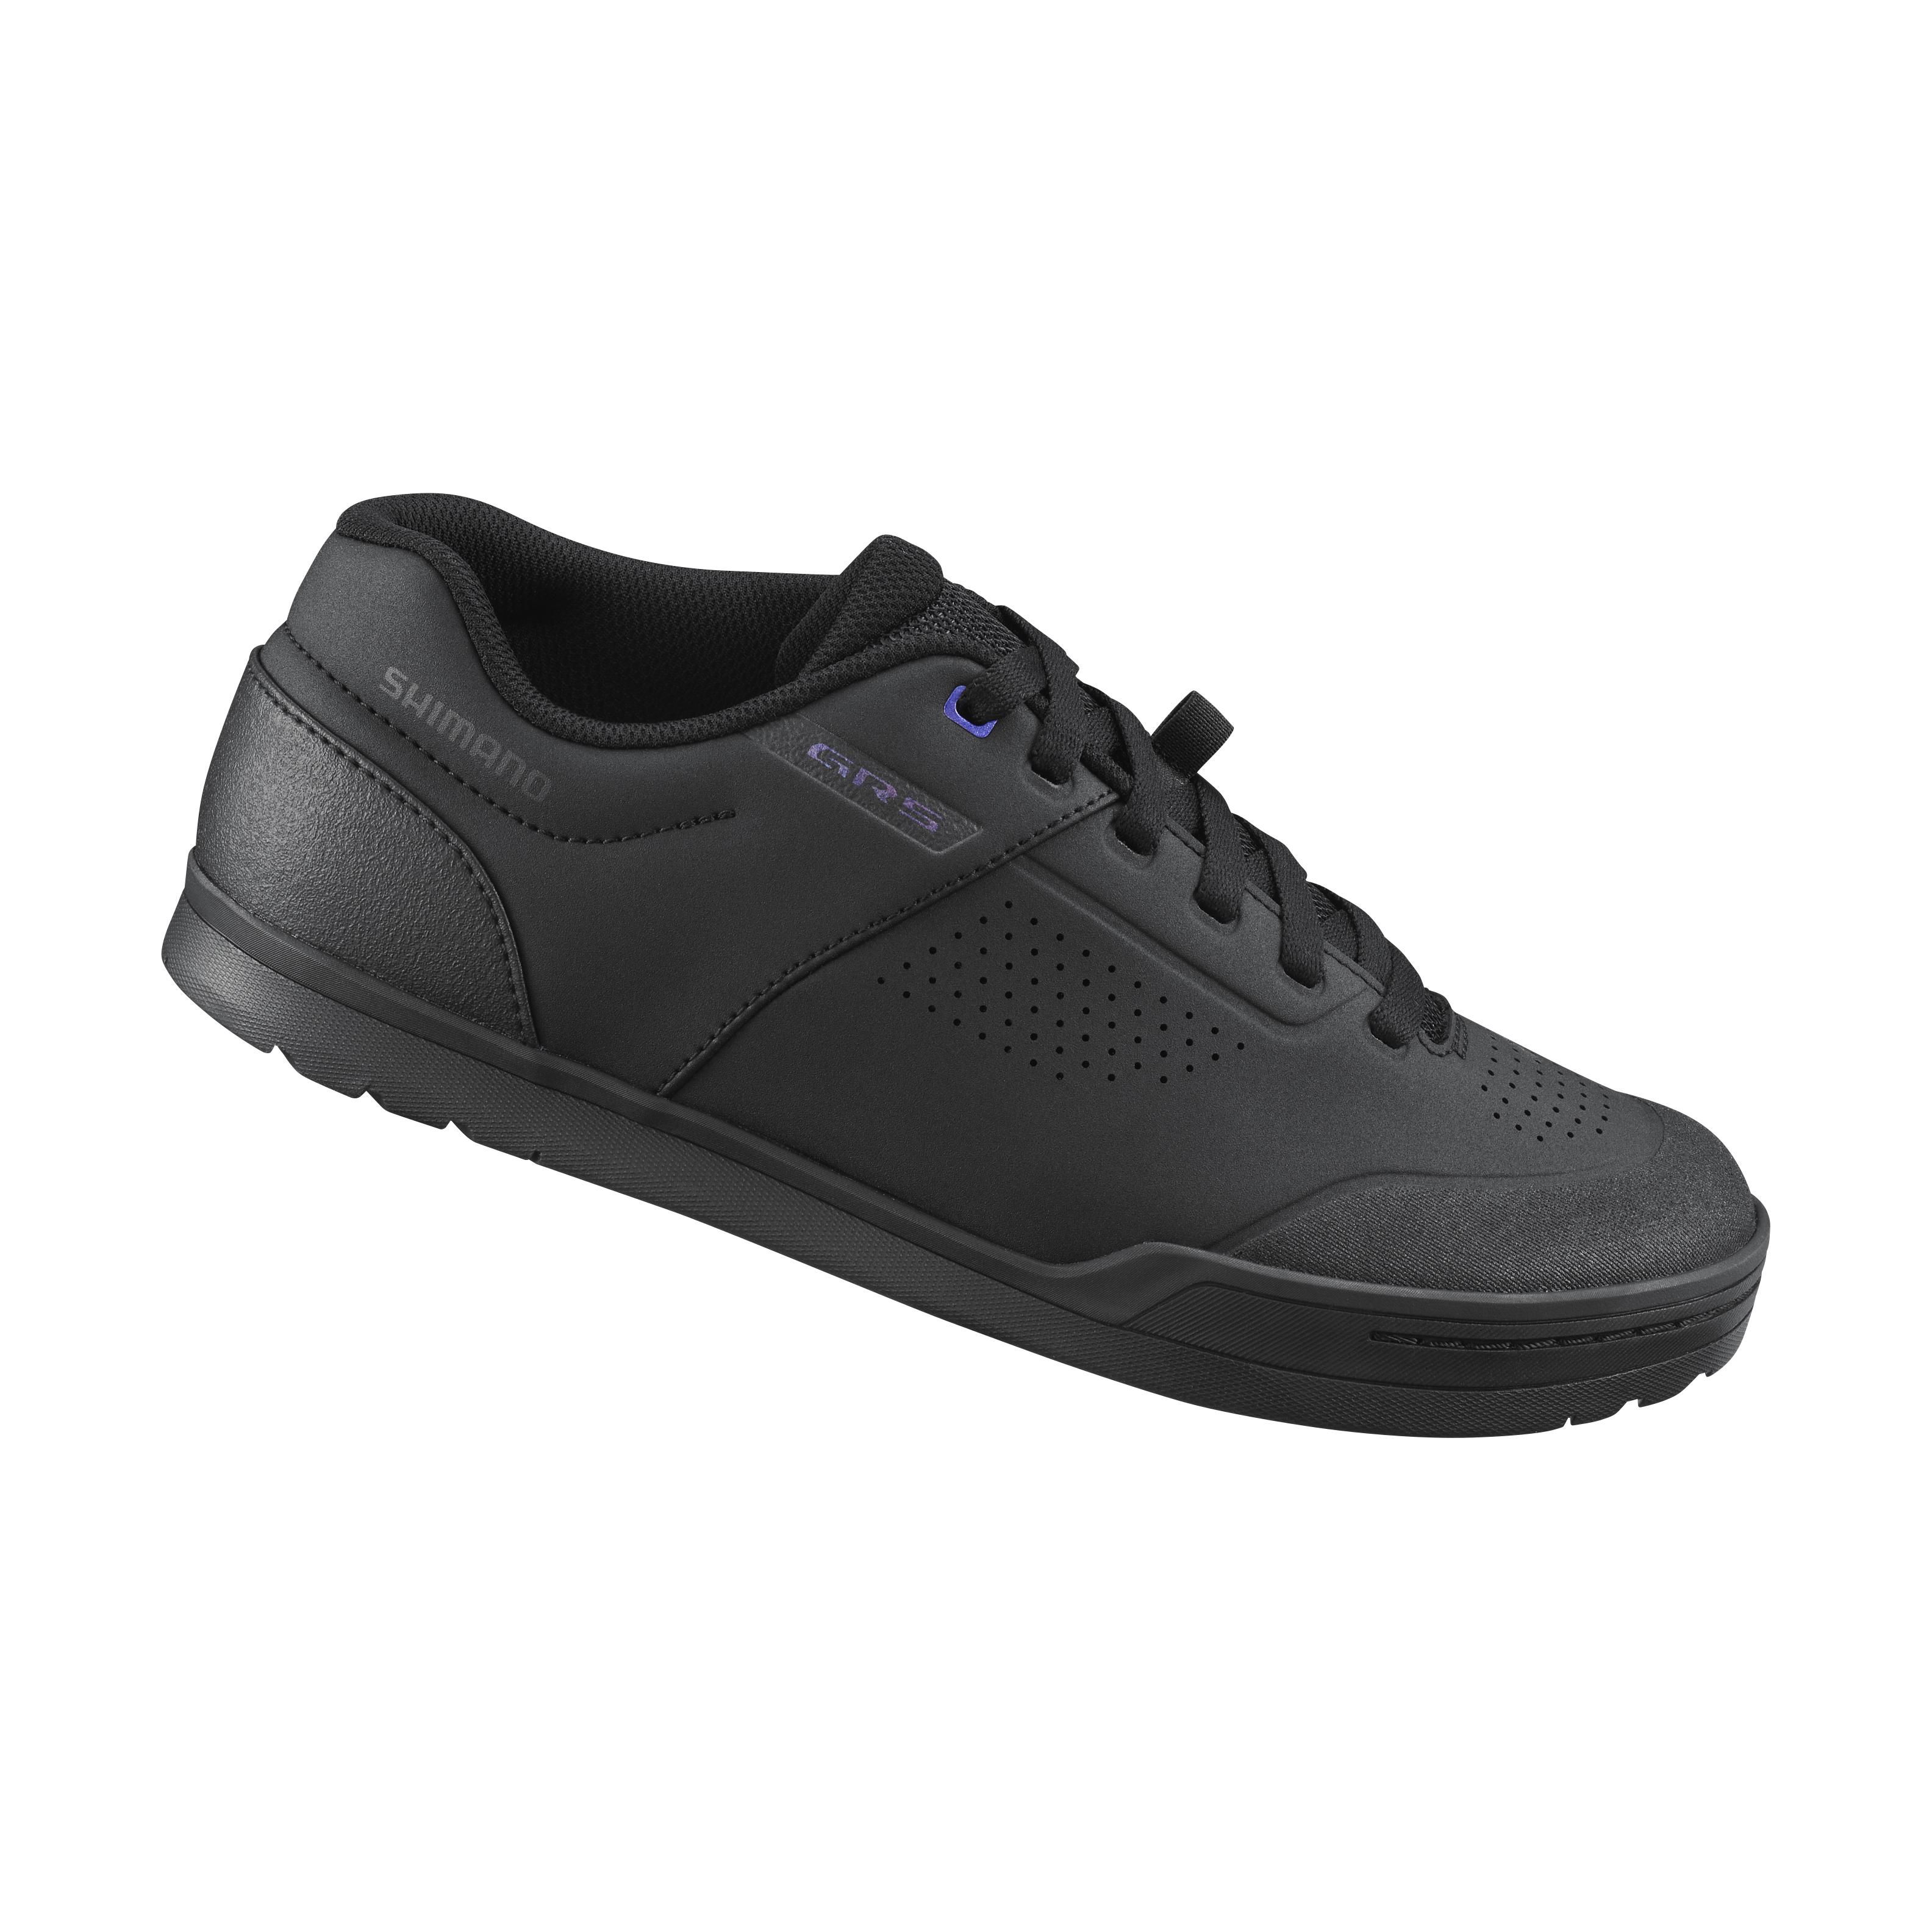 SHIMANO MTB obuv SH-GR501, černá, 41